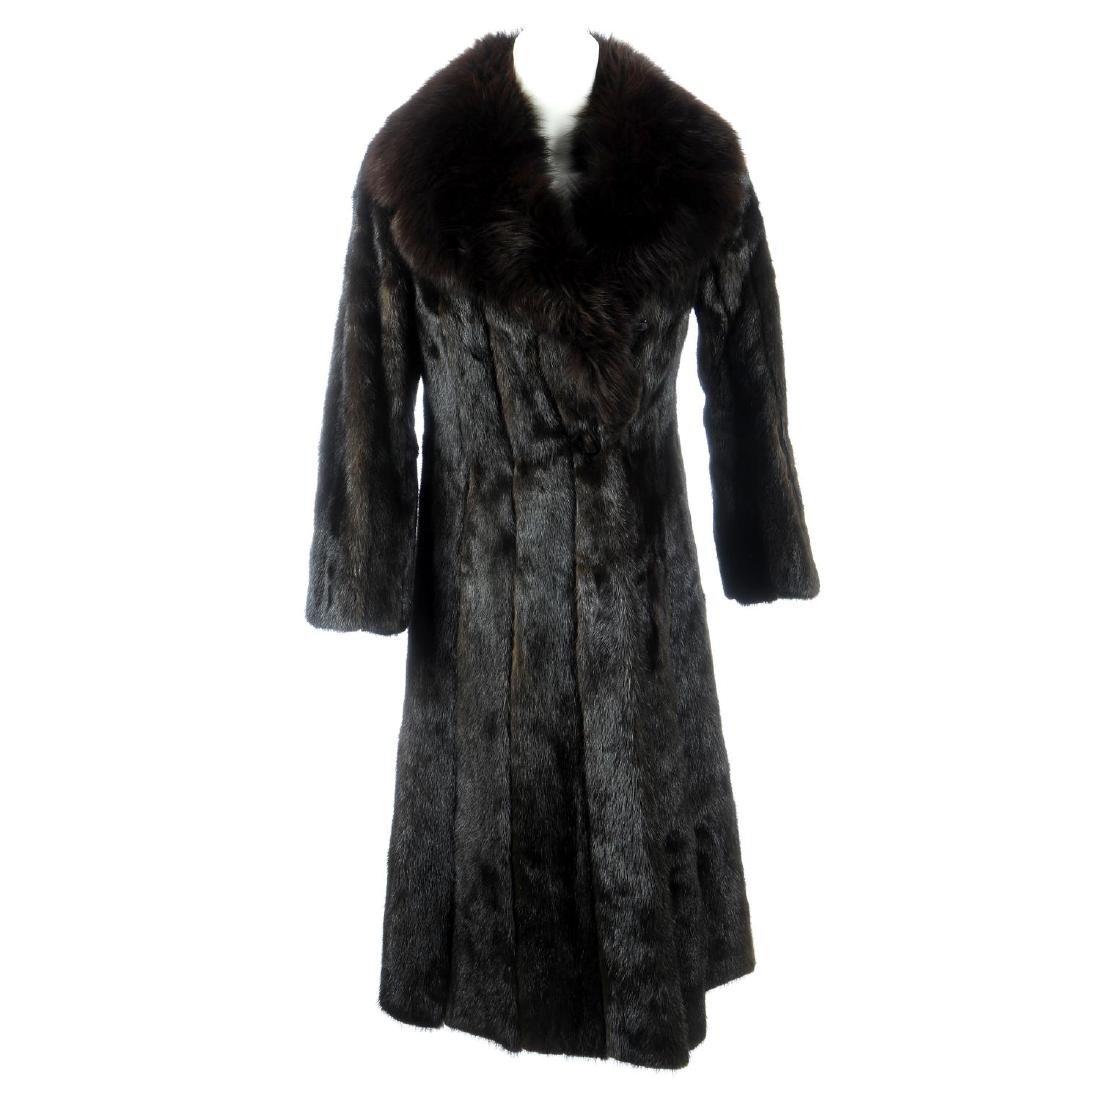 A dark ranch mink full-length coat with fox fur collar.